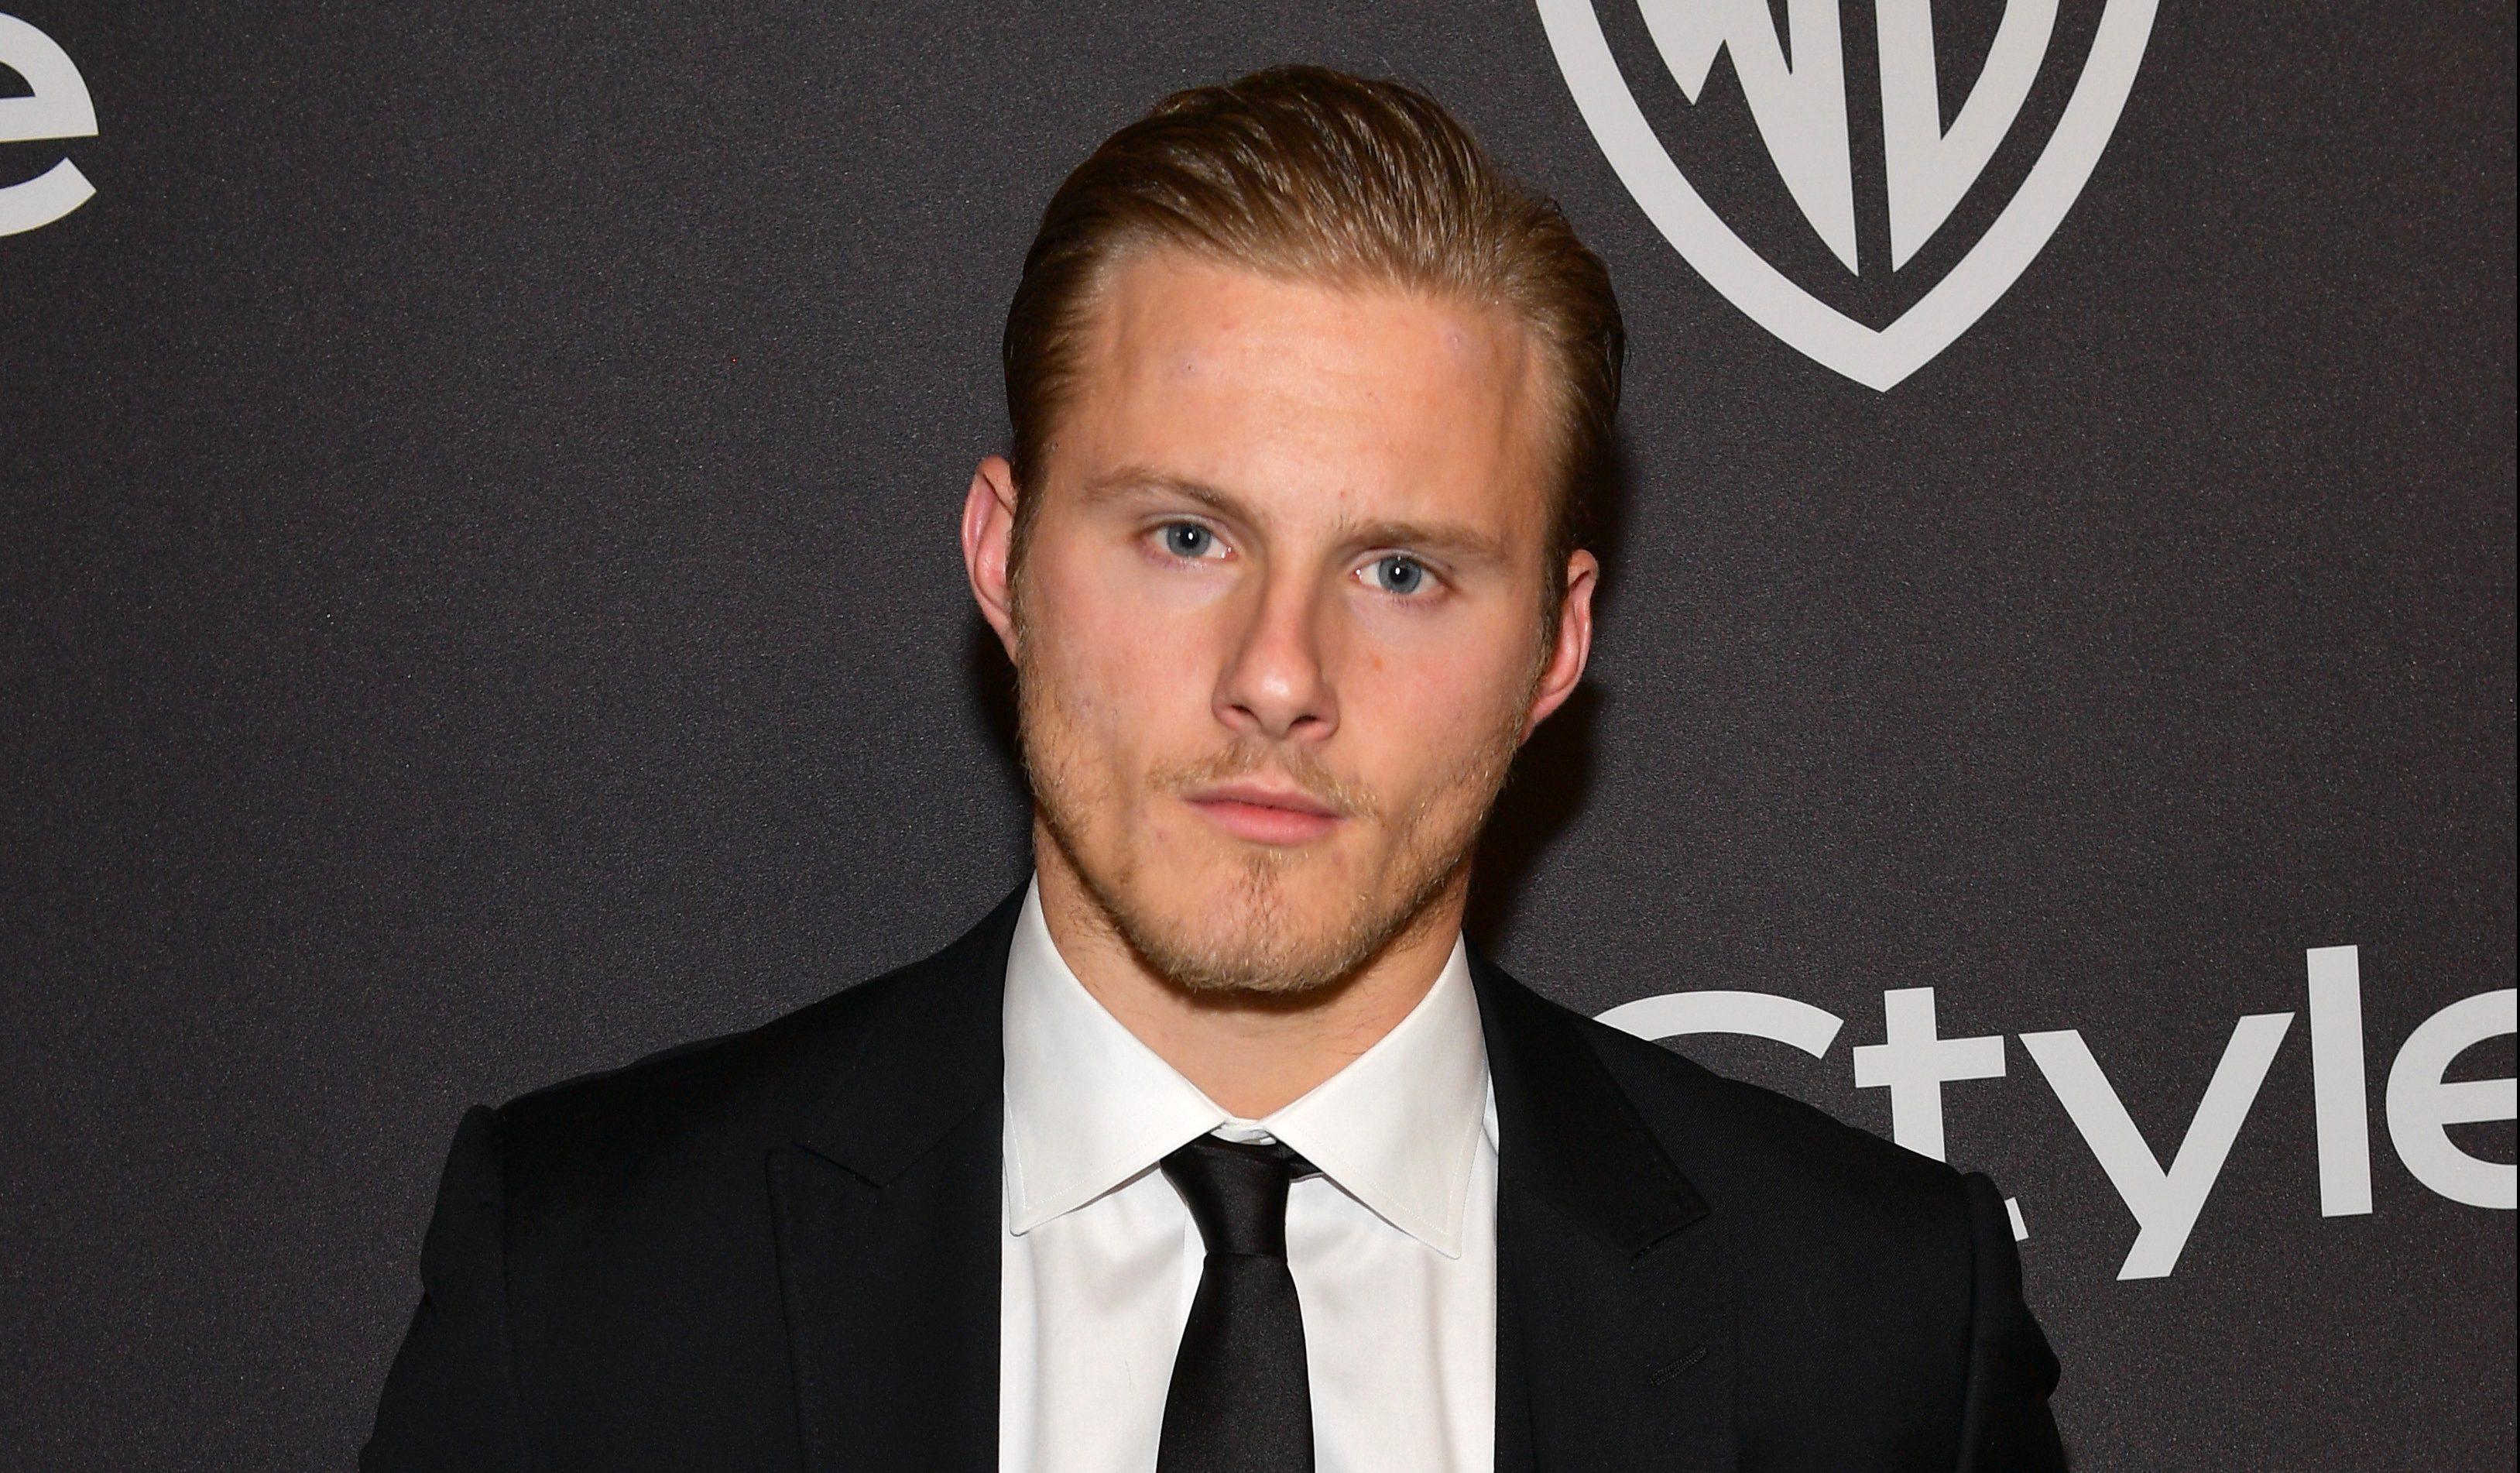 Vikings star Alexander Ludwig breaks diet with Travis Fimmel as fans freak out over reunion